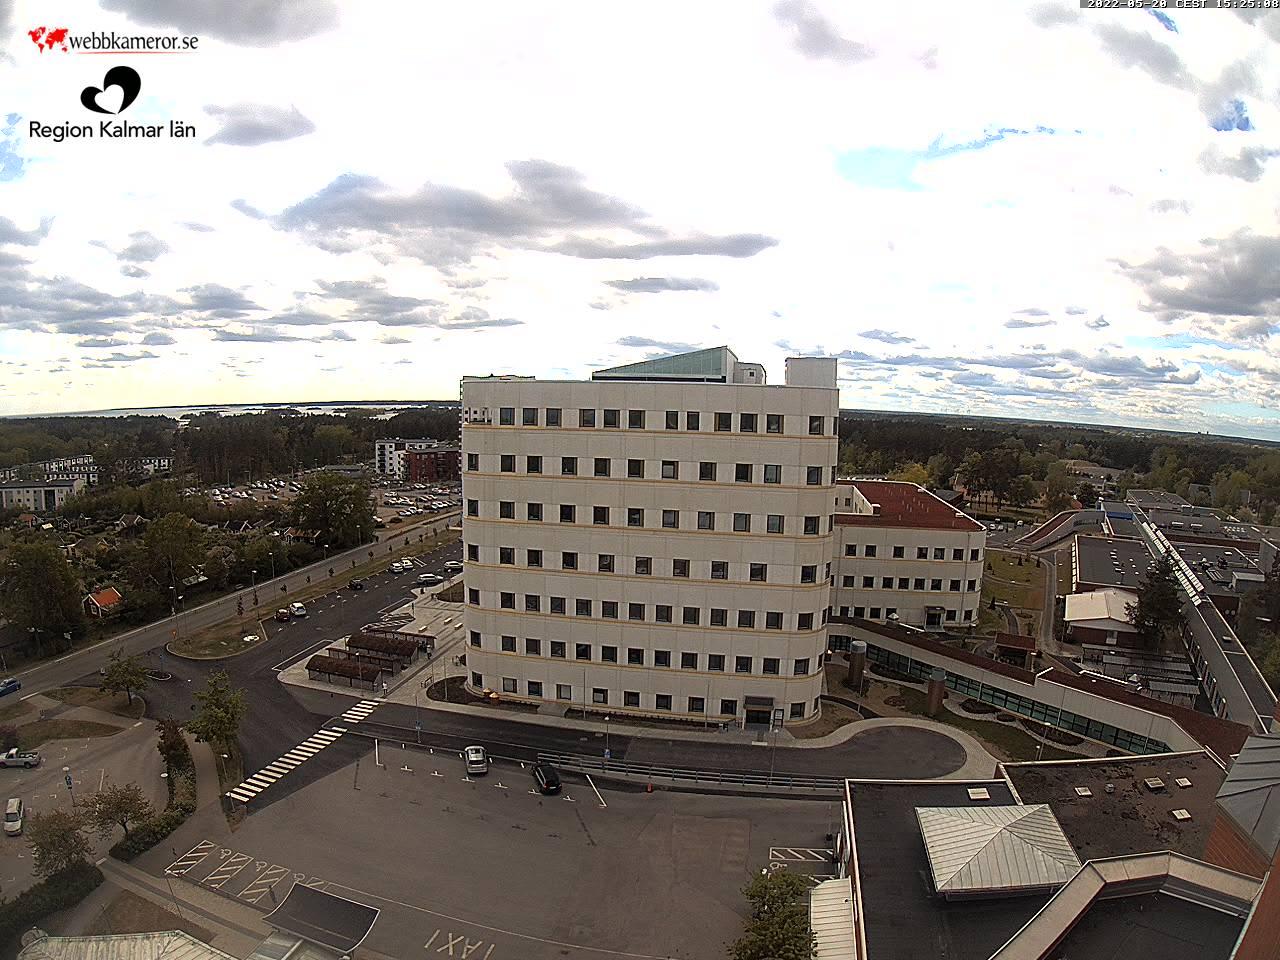 Webbkamera - Kalmar